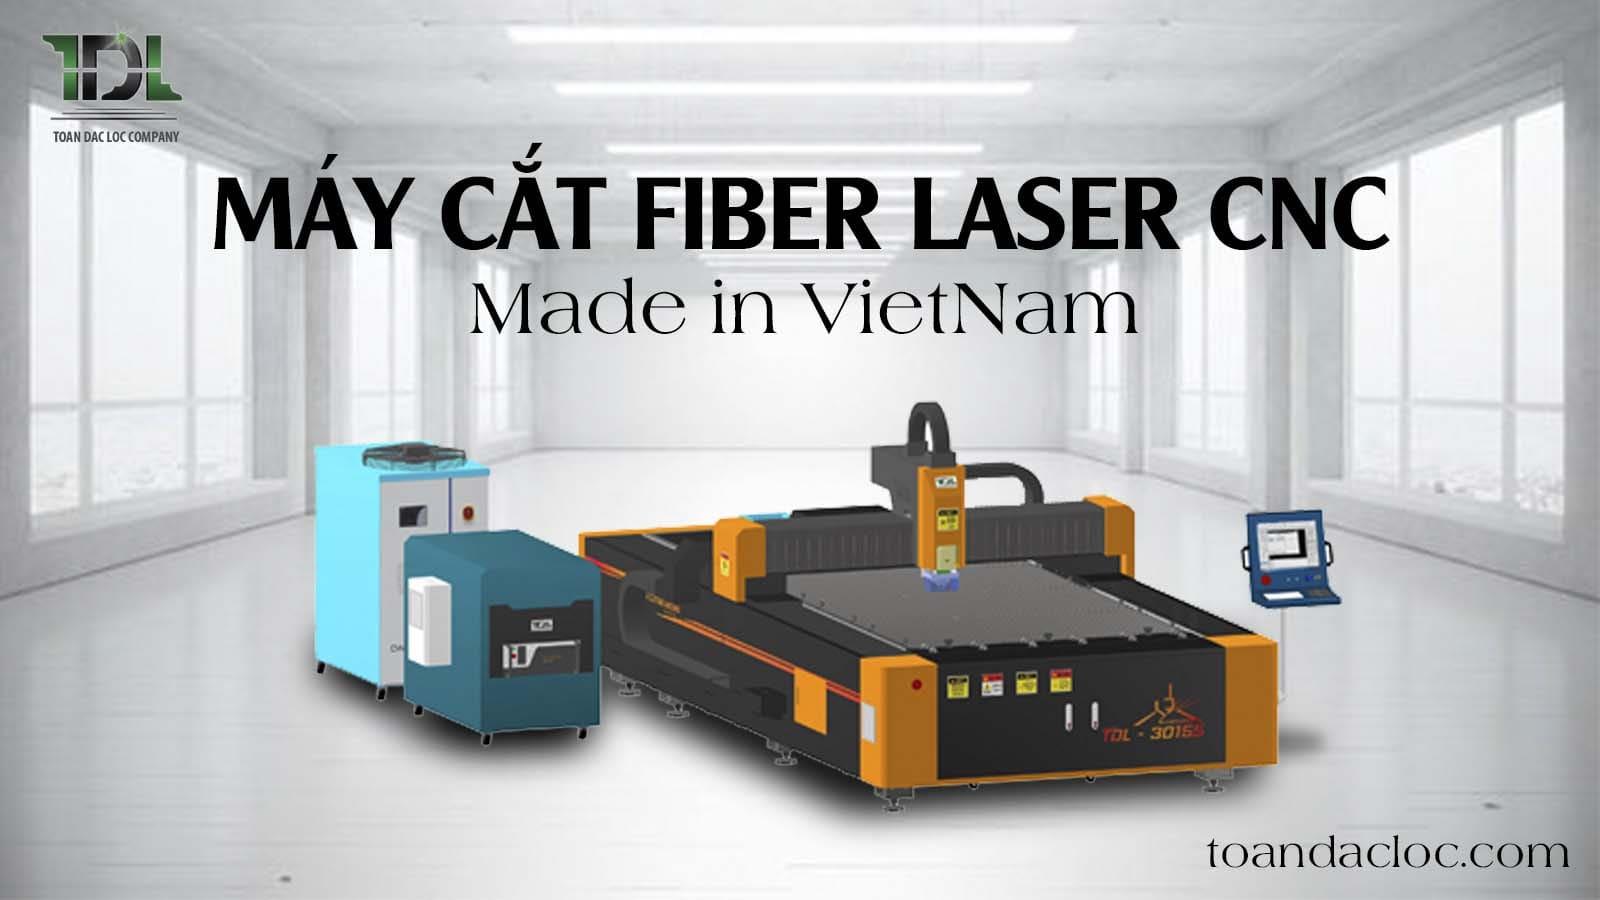 Máy cắt fiber laser cnc giá rẻ